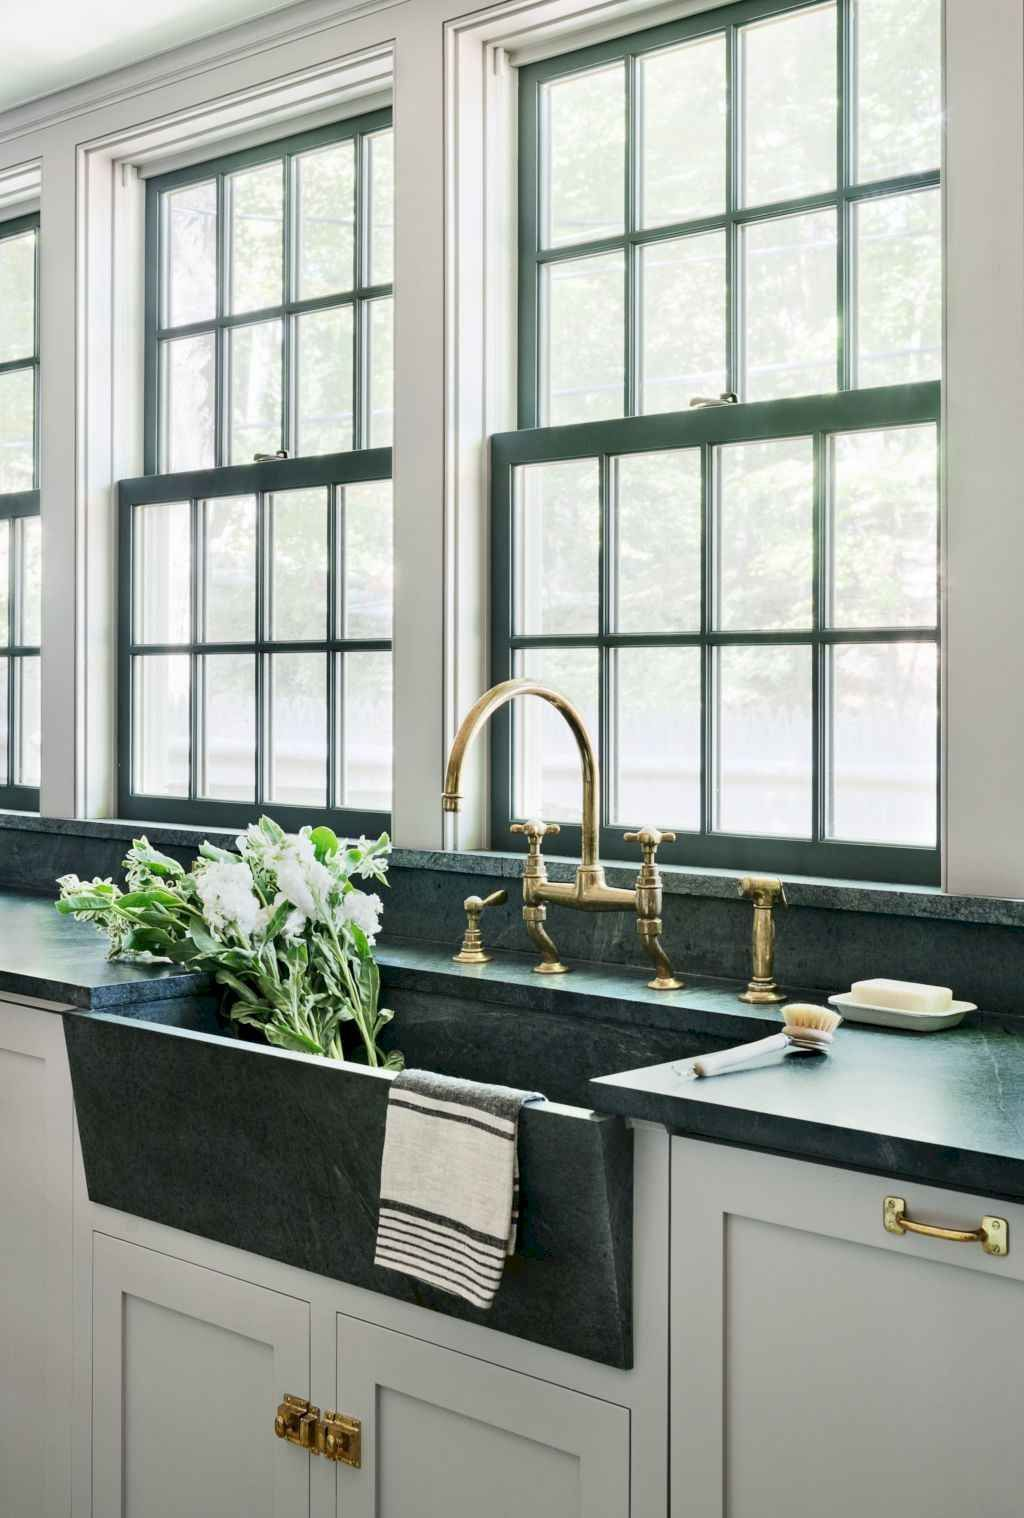 70 Modern Farmhouse Kitchen Sink Decor Ideas   Farmhouse ... on Farmhouse Kitchen Sink Ideas  id=27650